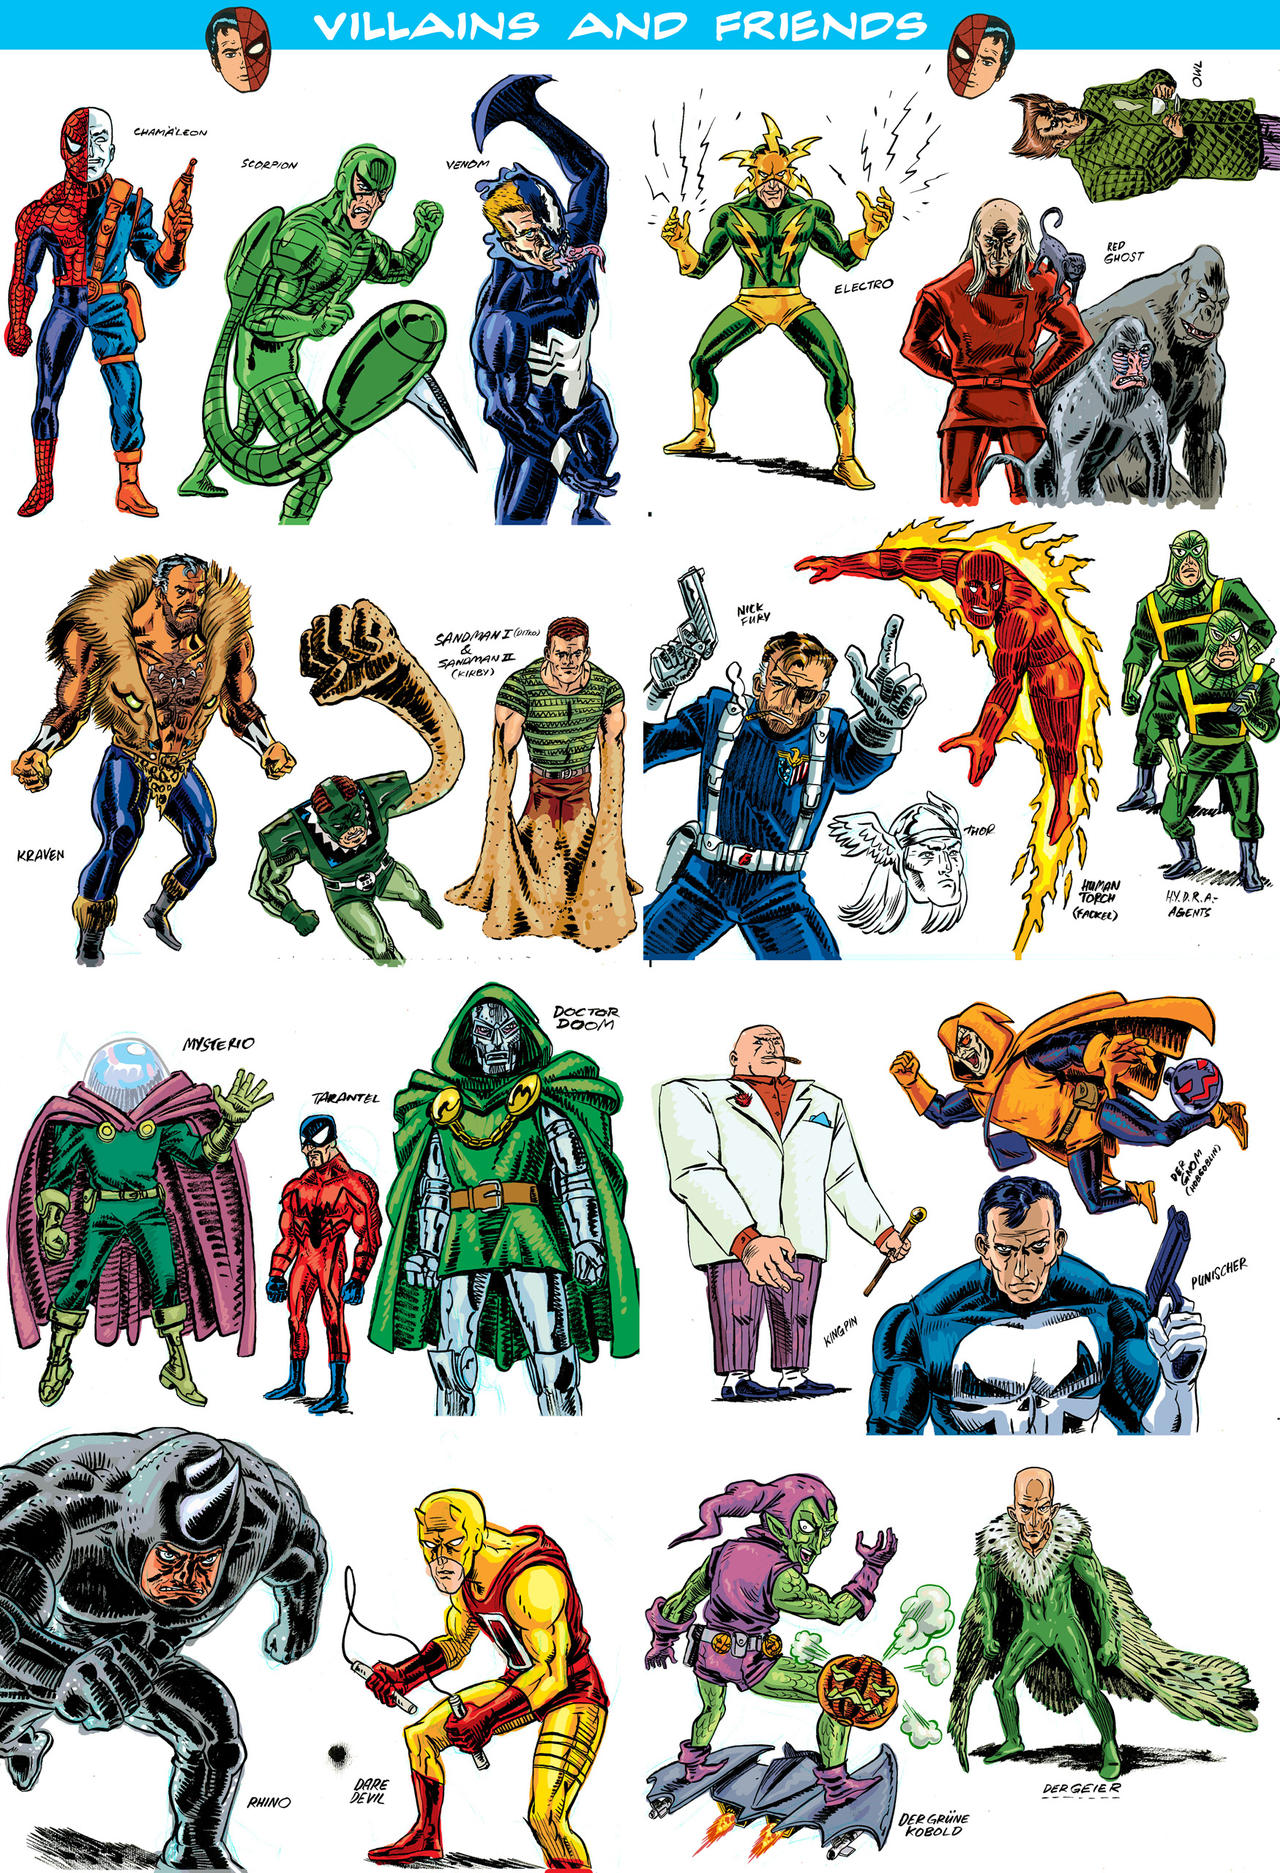 Spiderman villains - photo#11